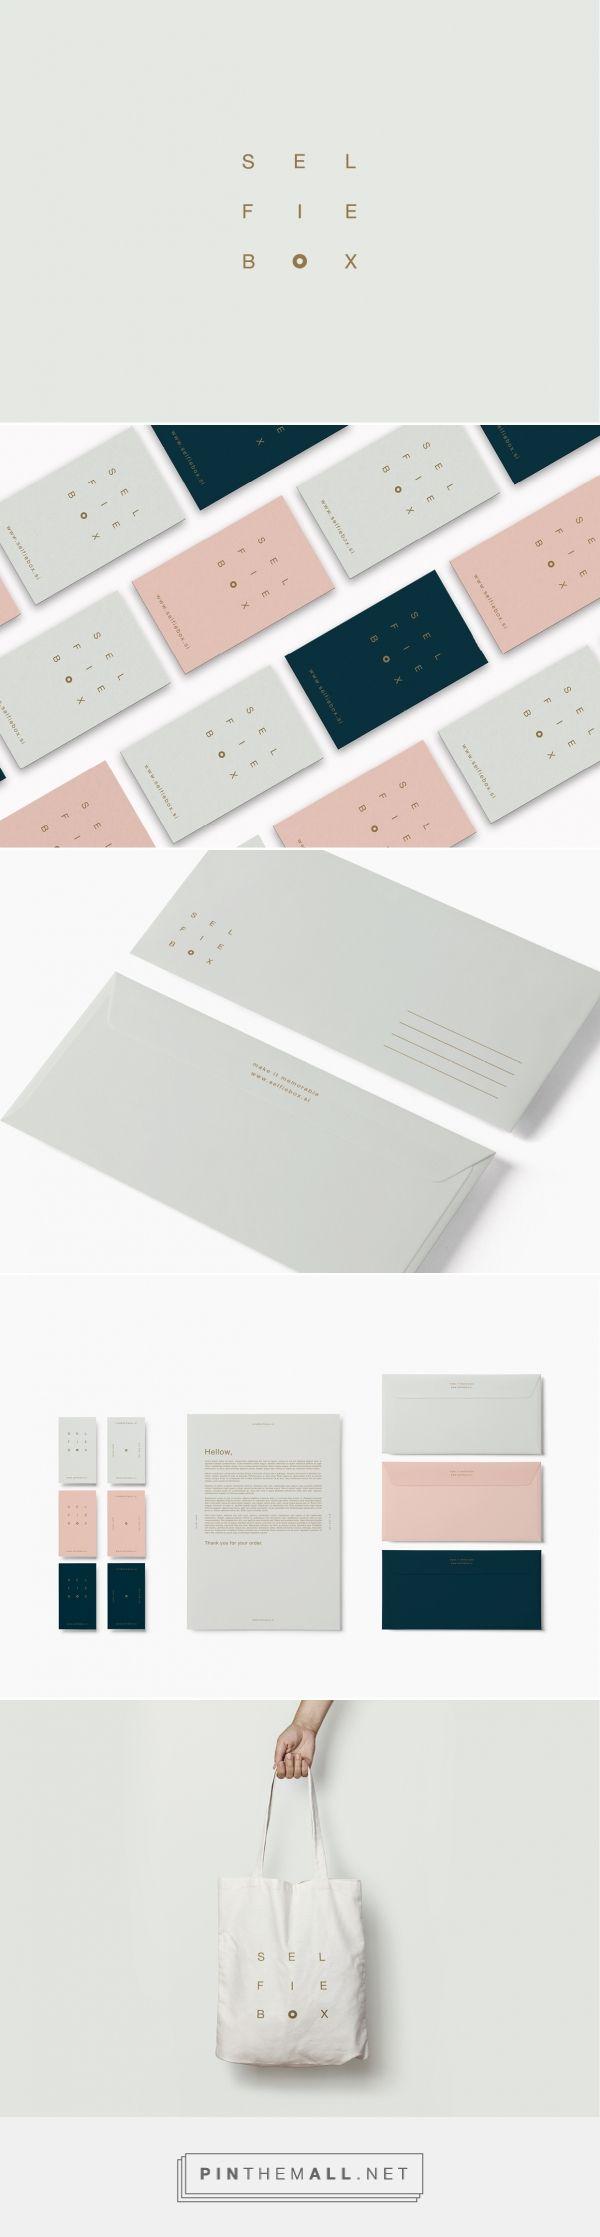 selfie box branding by wedesignstuff fivestar branding design and branding agency. Black Bedroom Furniture Sets. Home Design Ideas